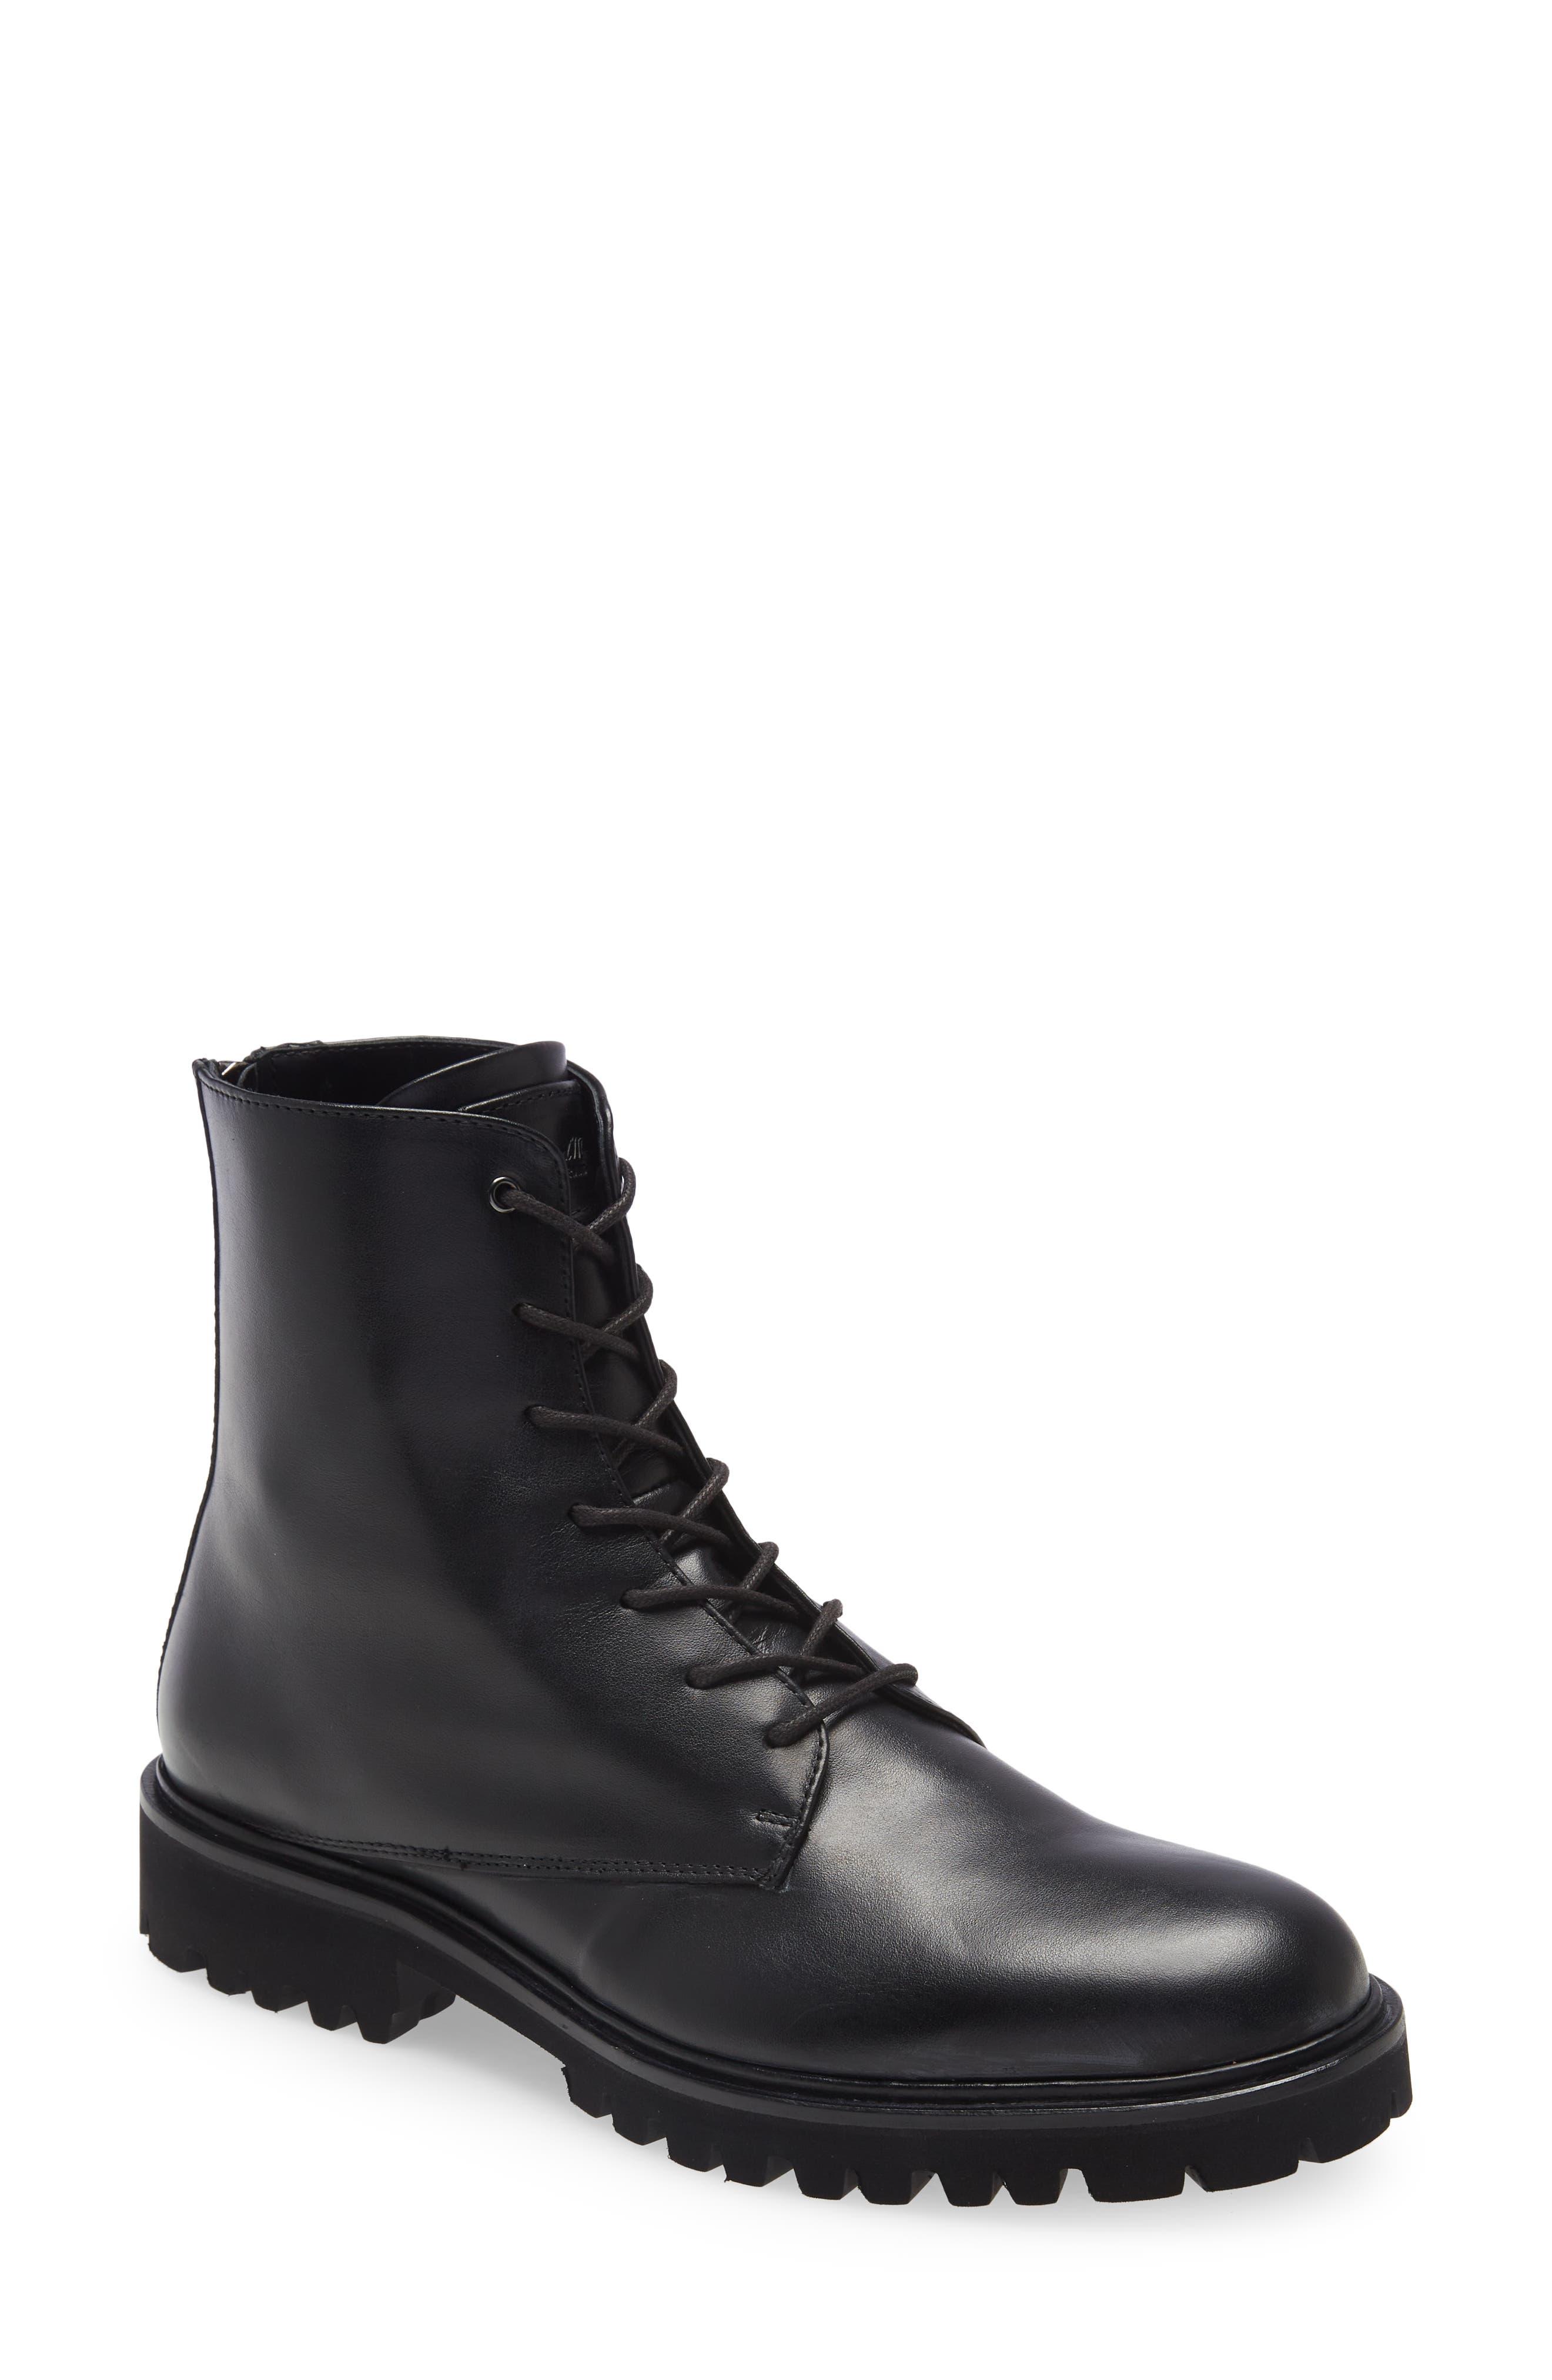 Modern City Combat Boot